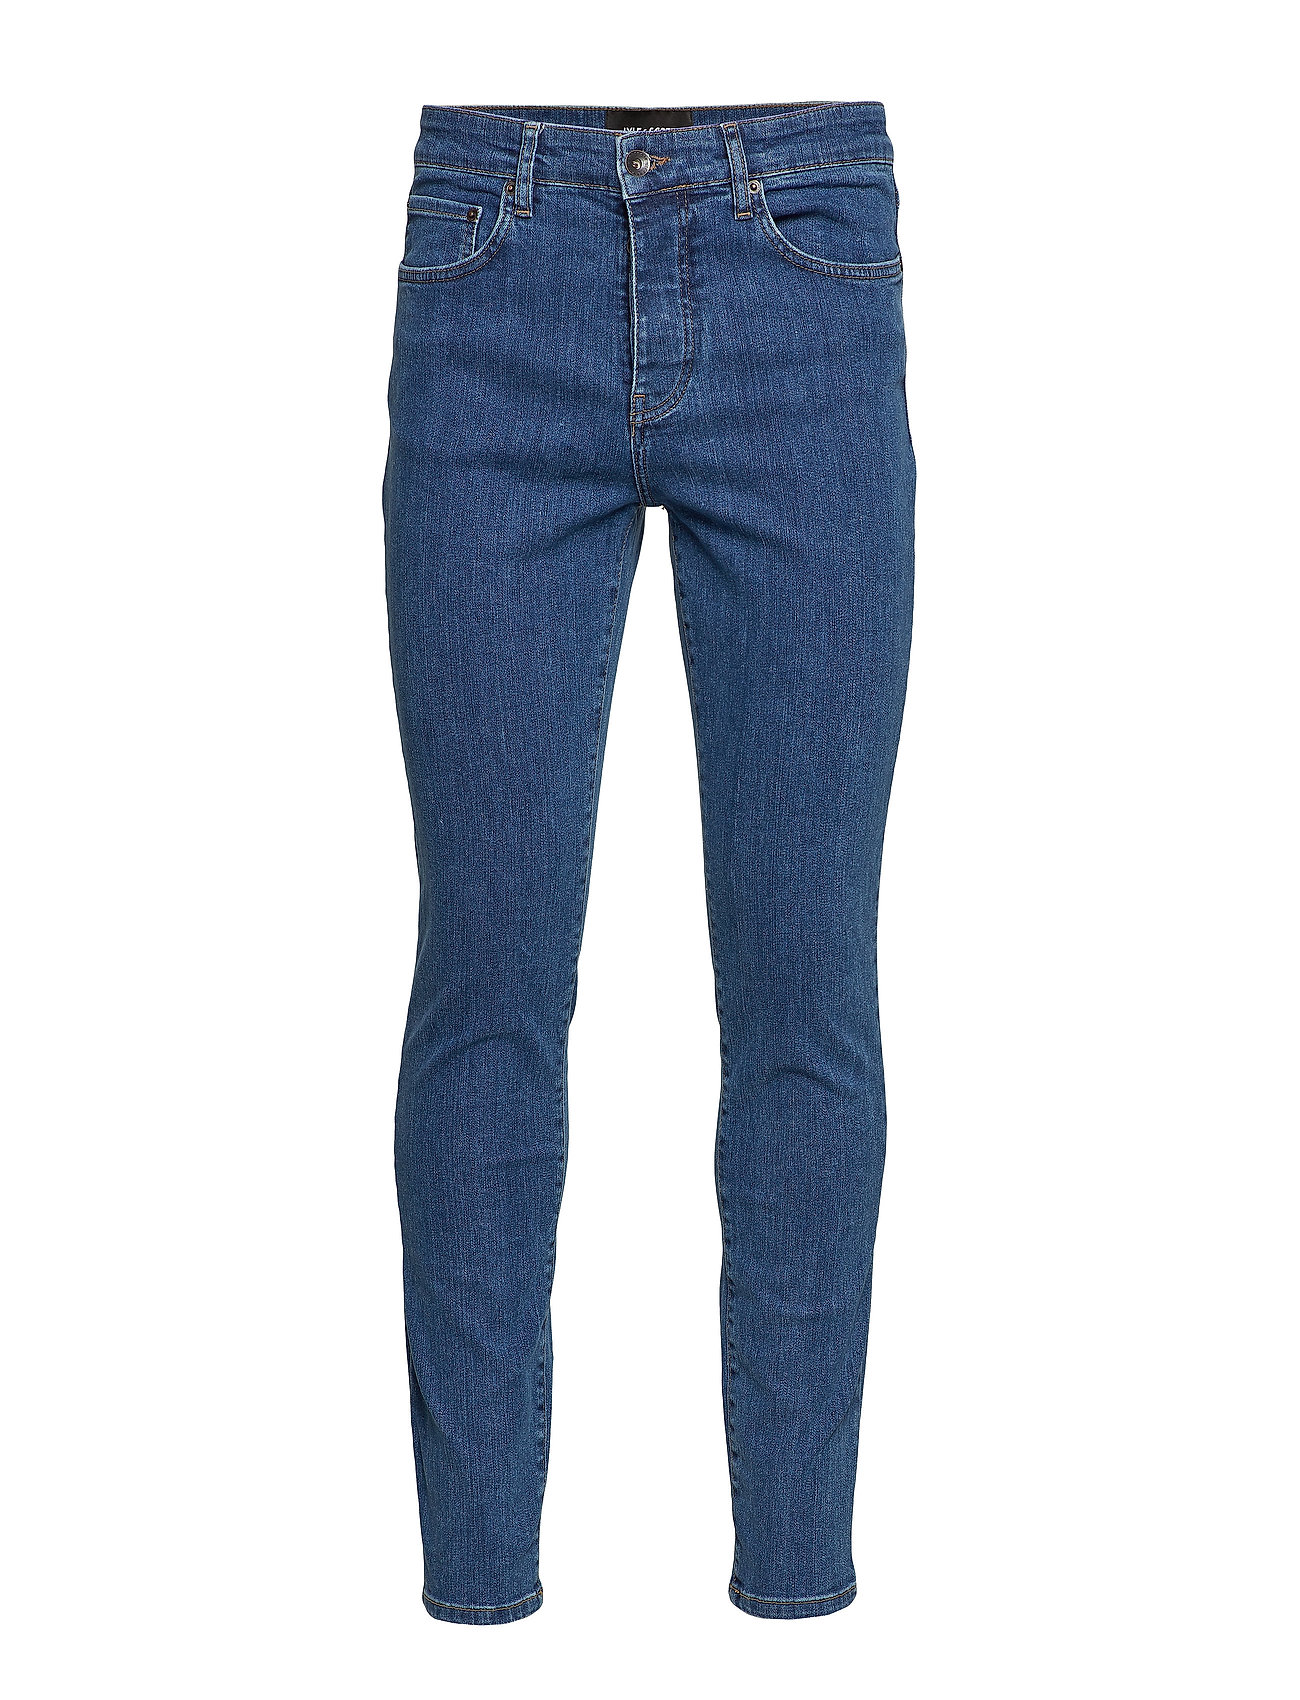 Image of Slim Fit Jean Skinny Jeans Blå Lyle & Scott (3491487295)